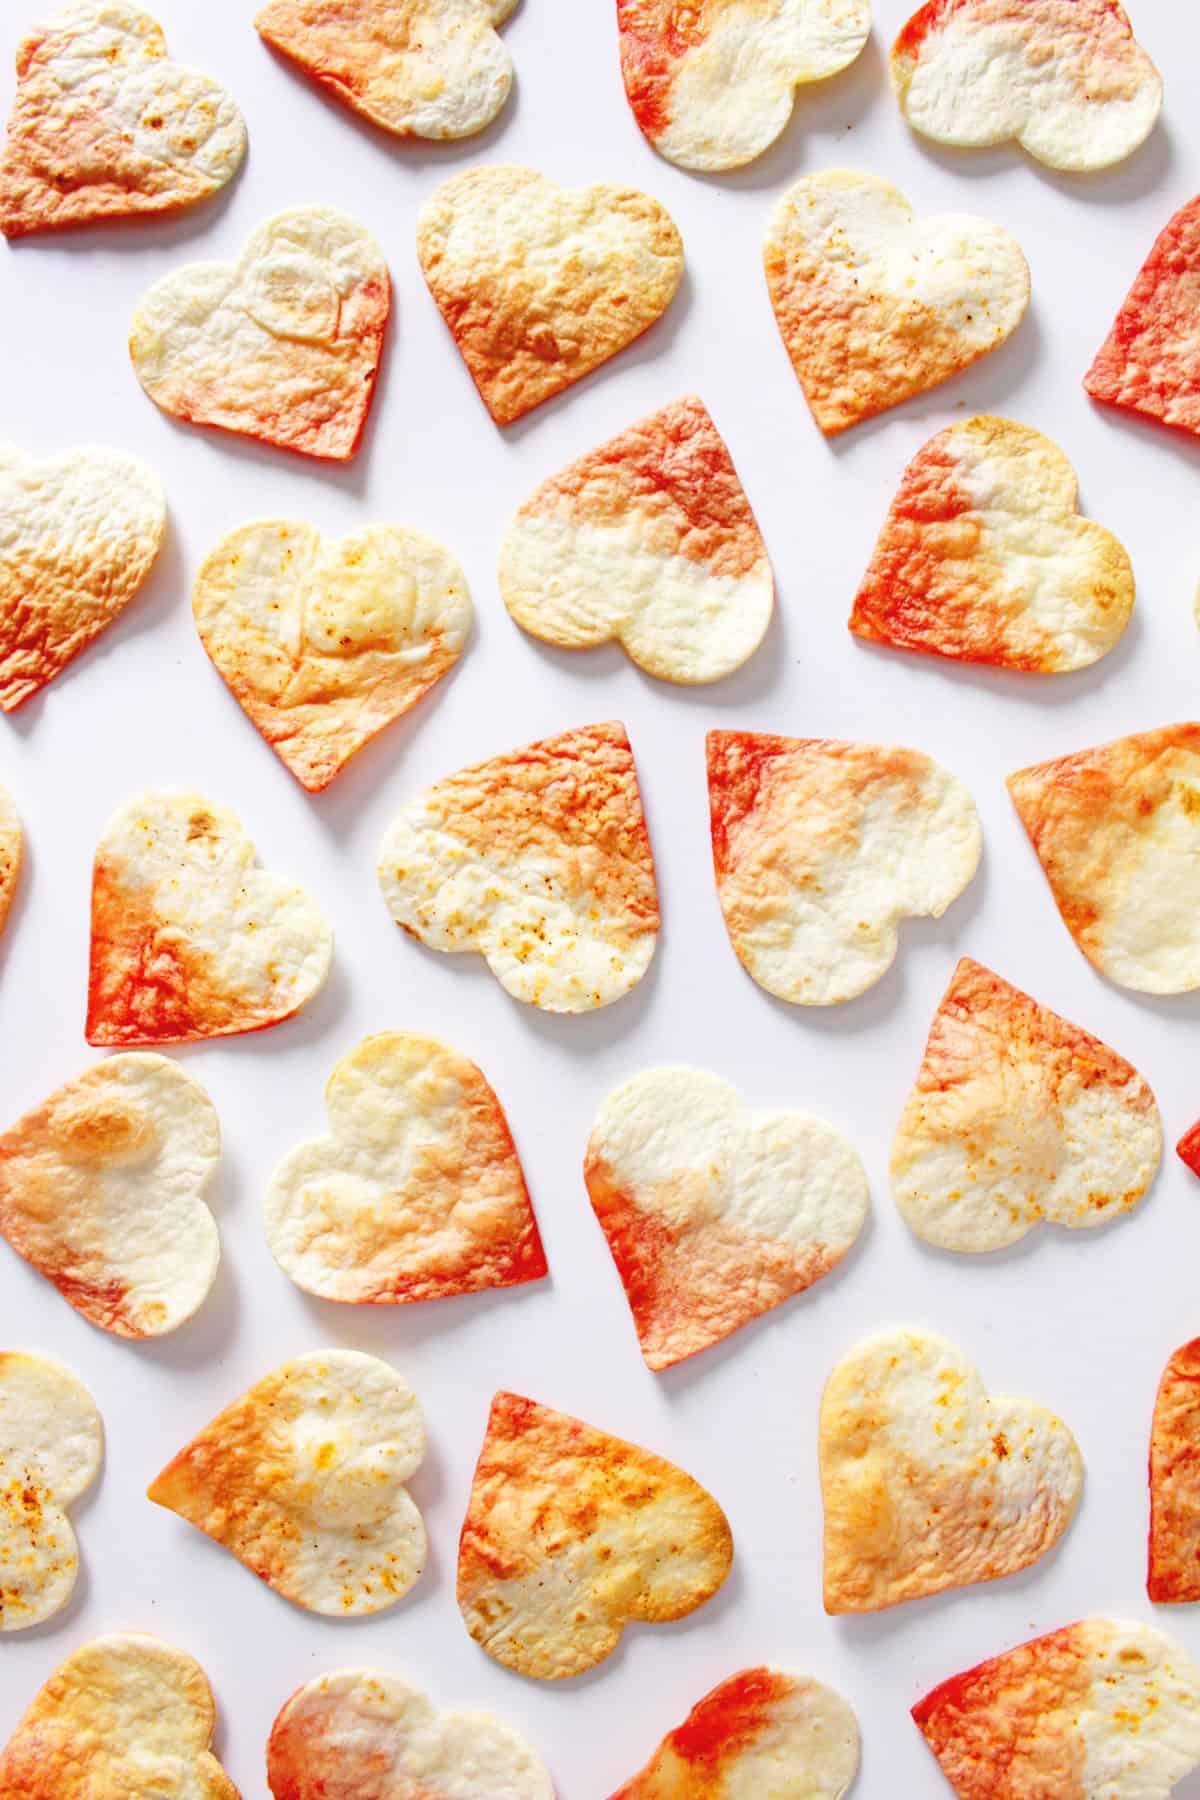 Valentine's Dip Dye Heart Tortilla Chips | Fish & Bull